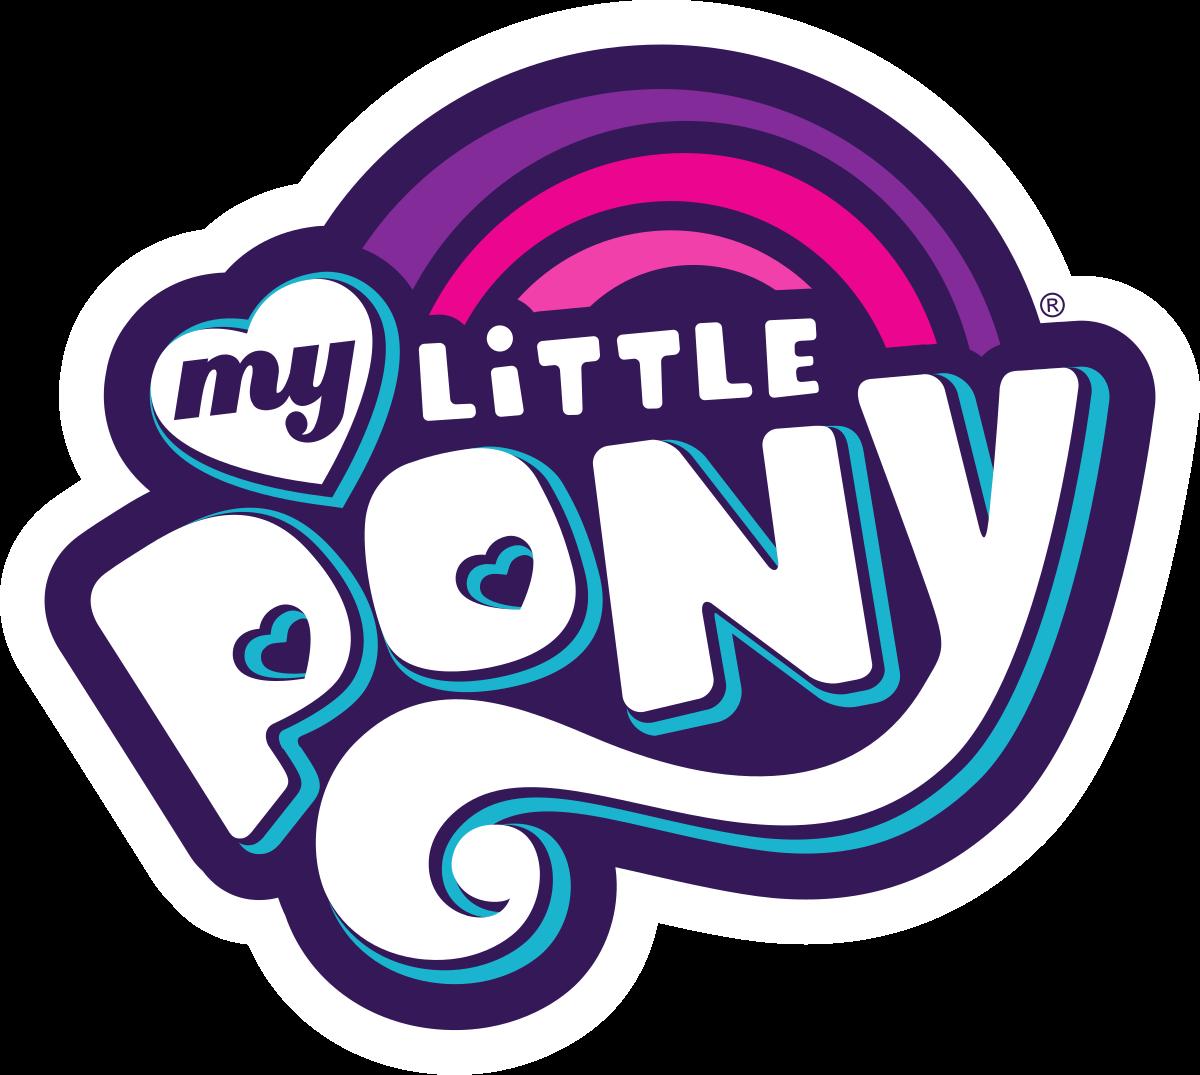 Drawn my little pony small #10